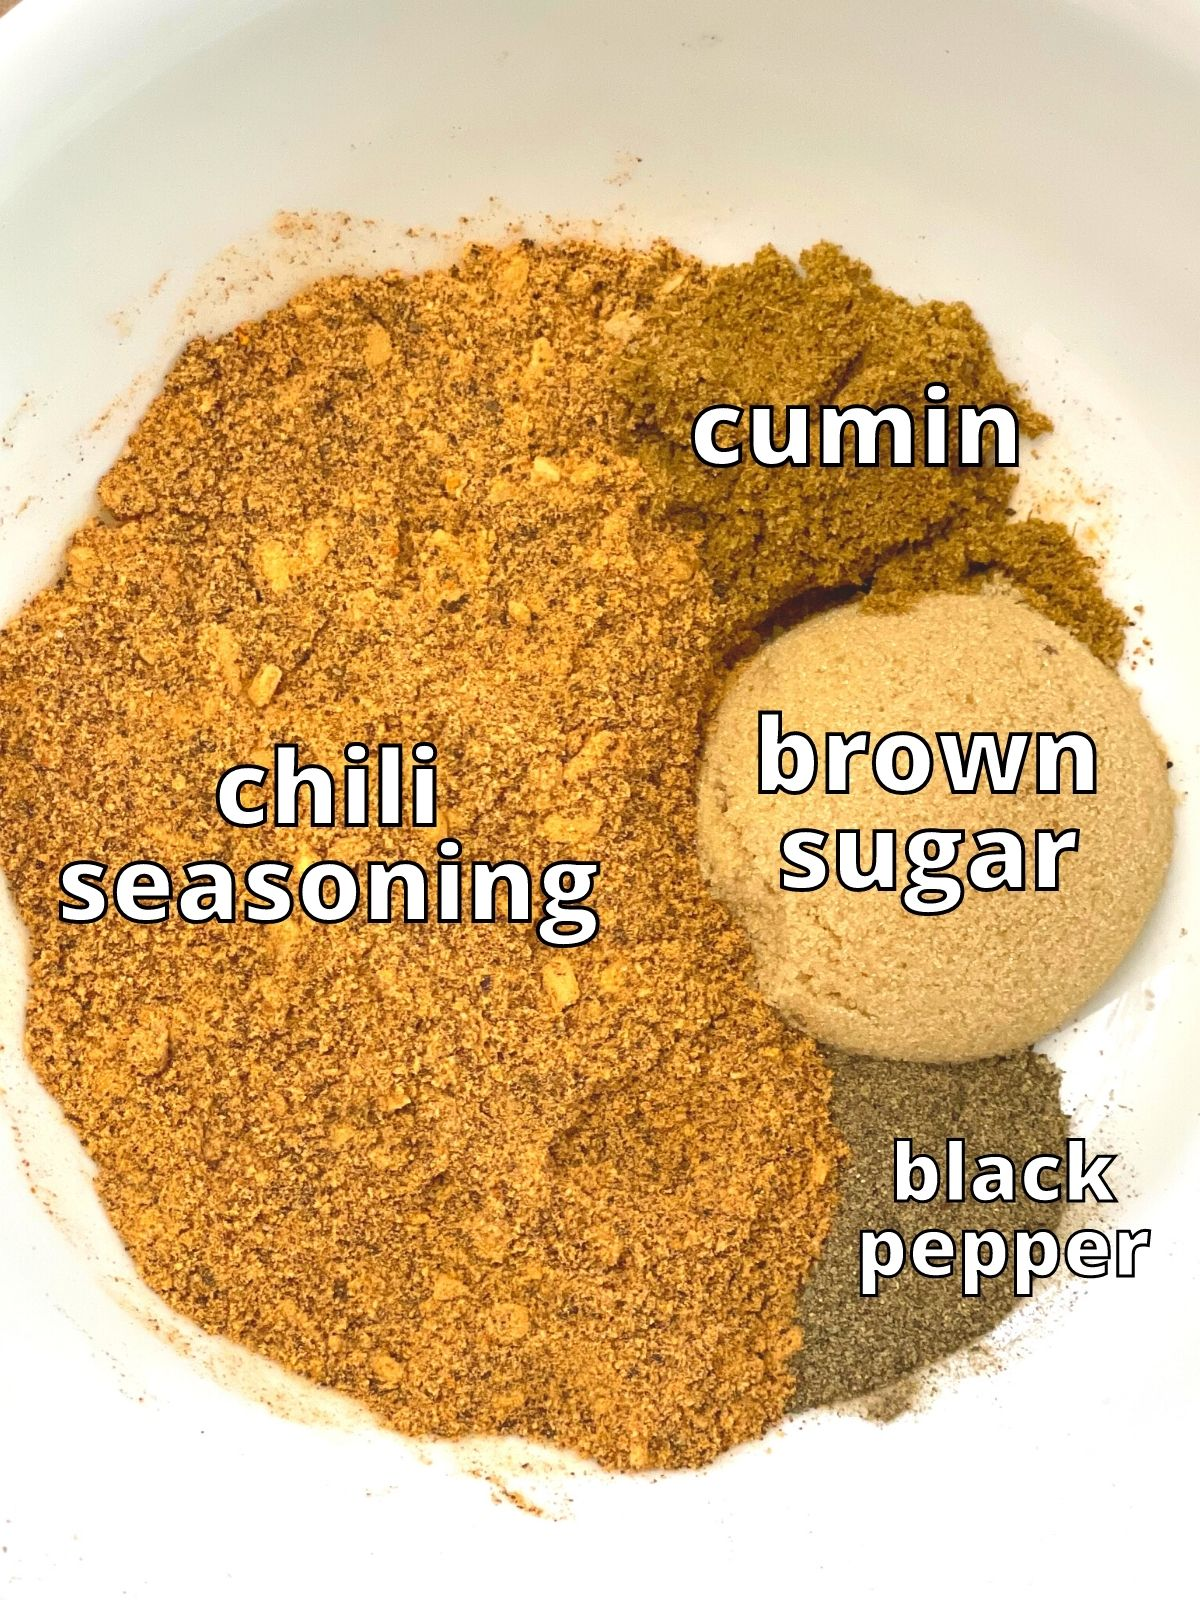 Blackened shrimp dry rub ingredients. Pictured is chili seasoning, cumin, brown sugar, and black pepper.